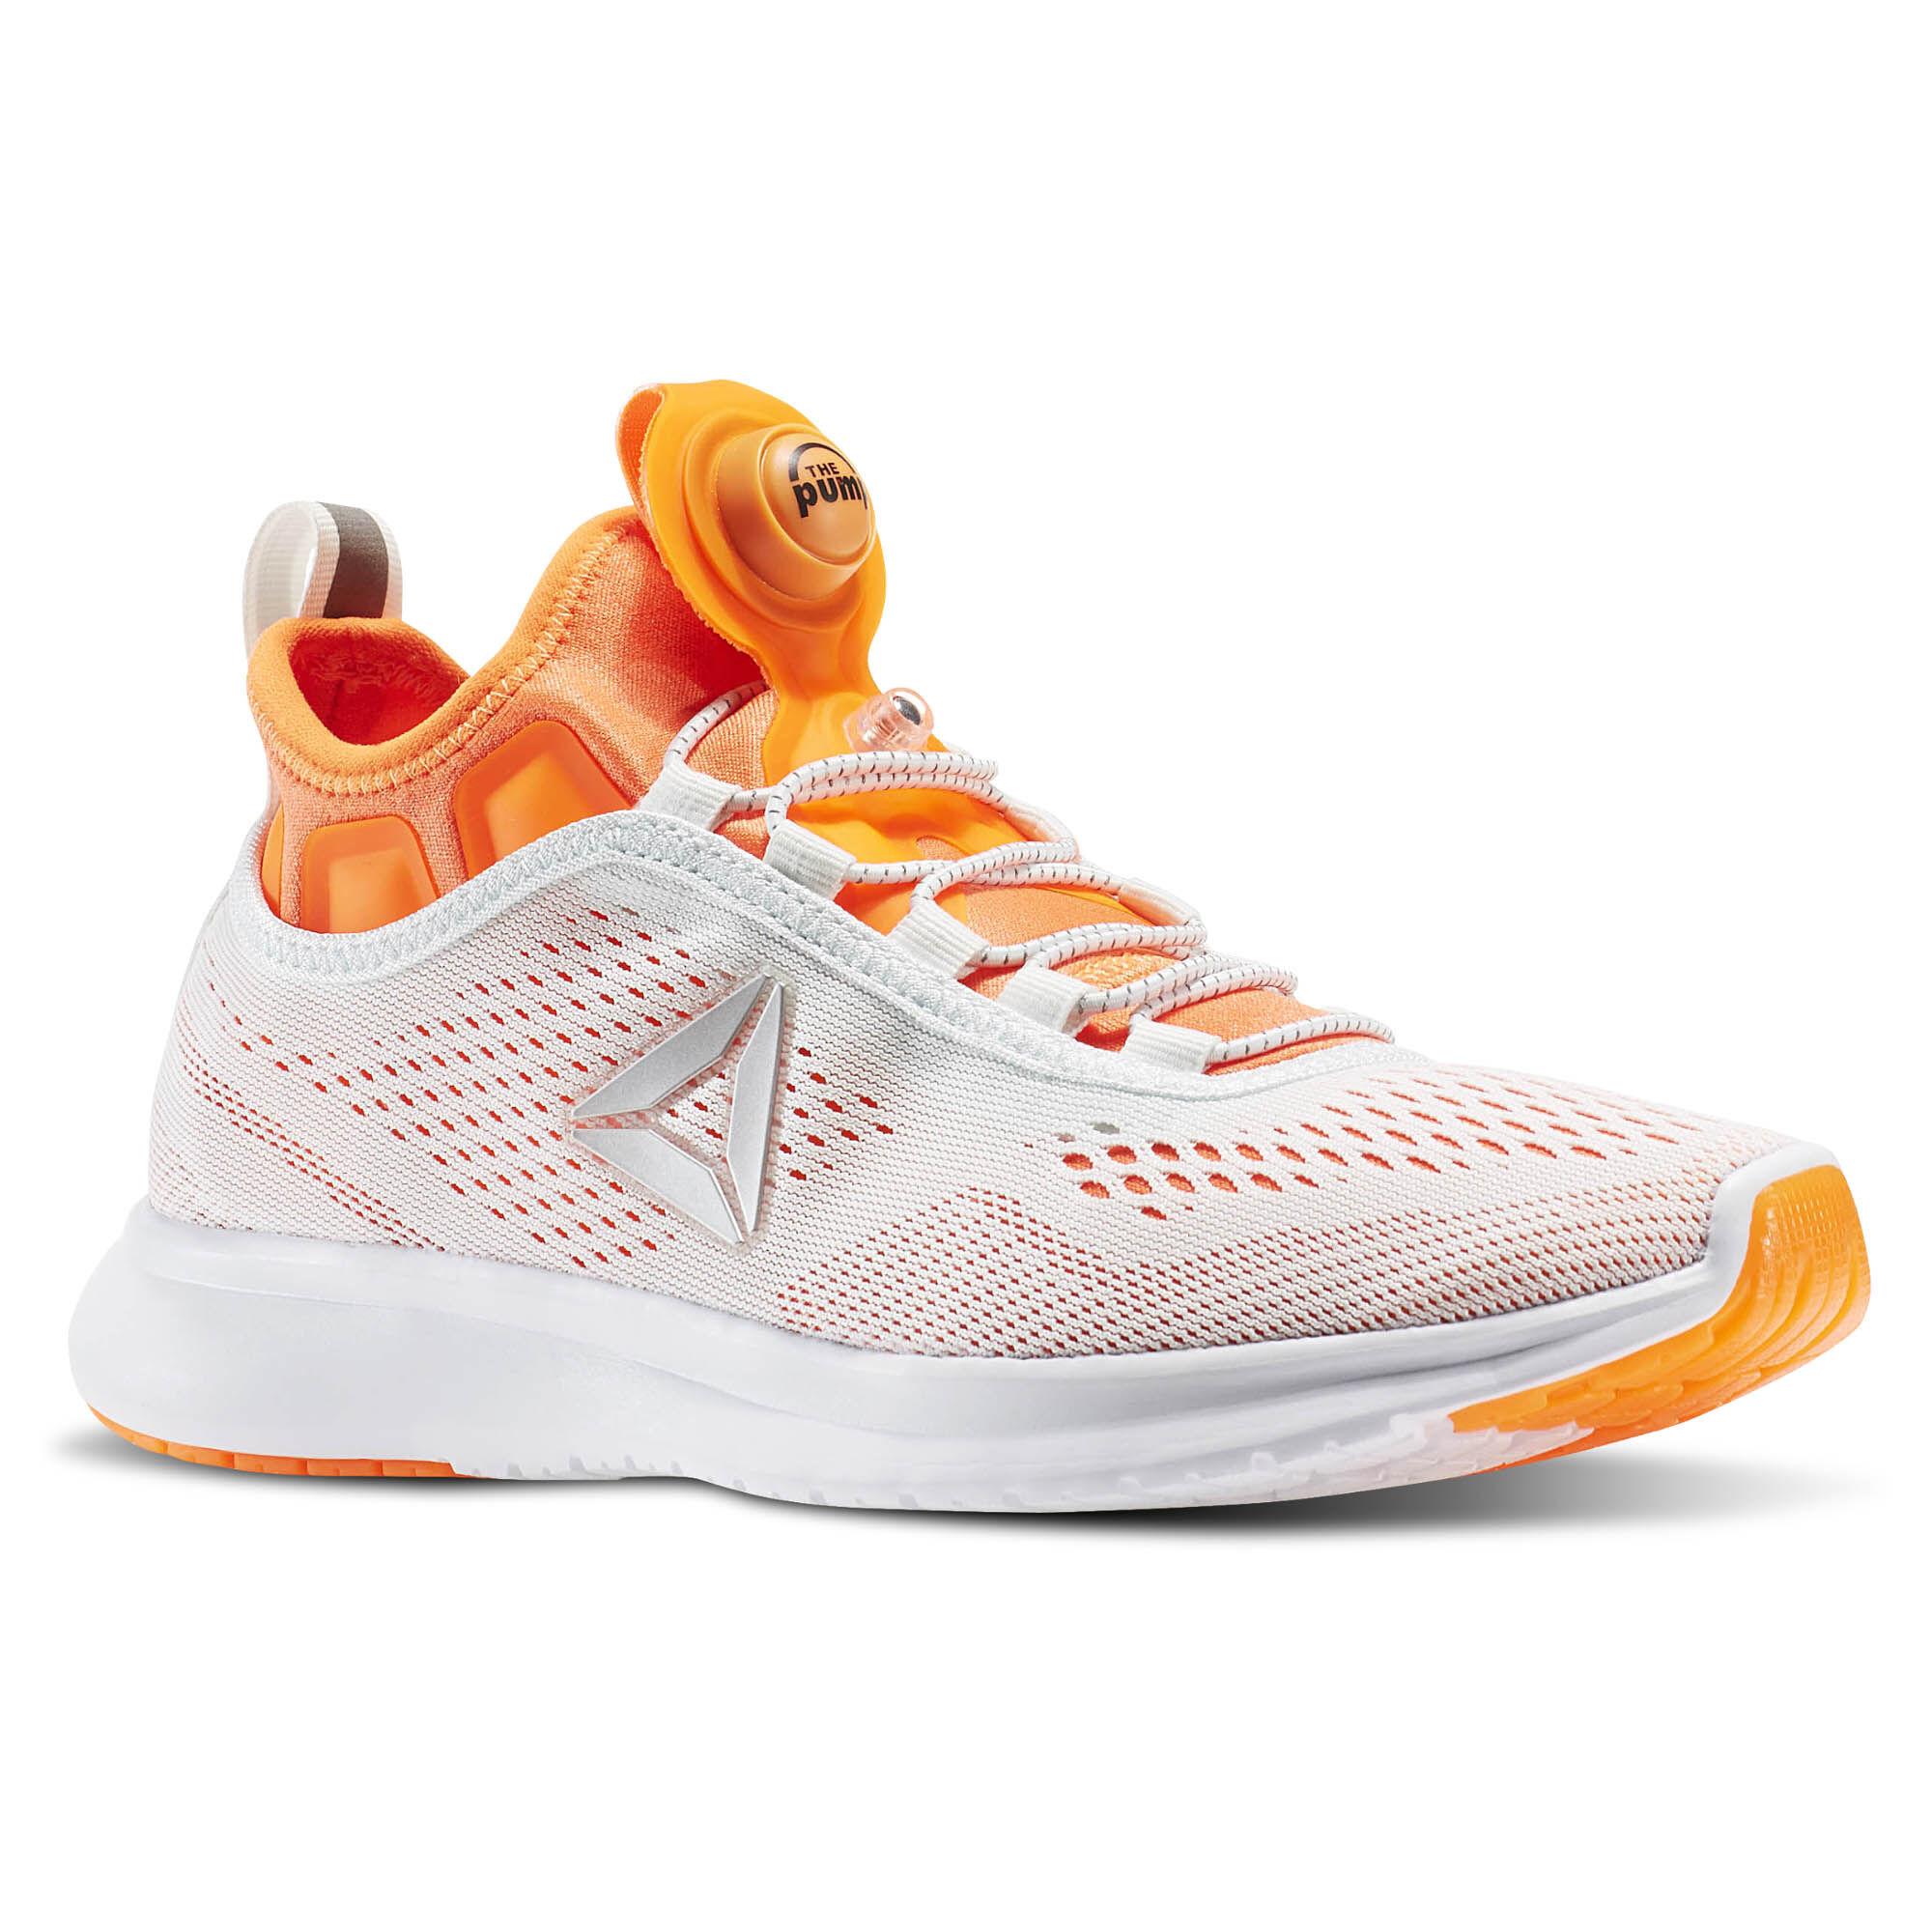 Buy reebok pump white orange,reebok sl flip